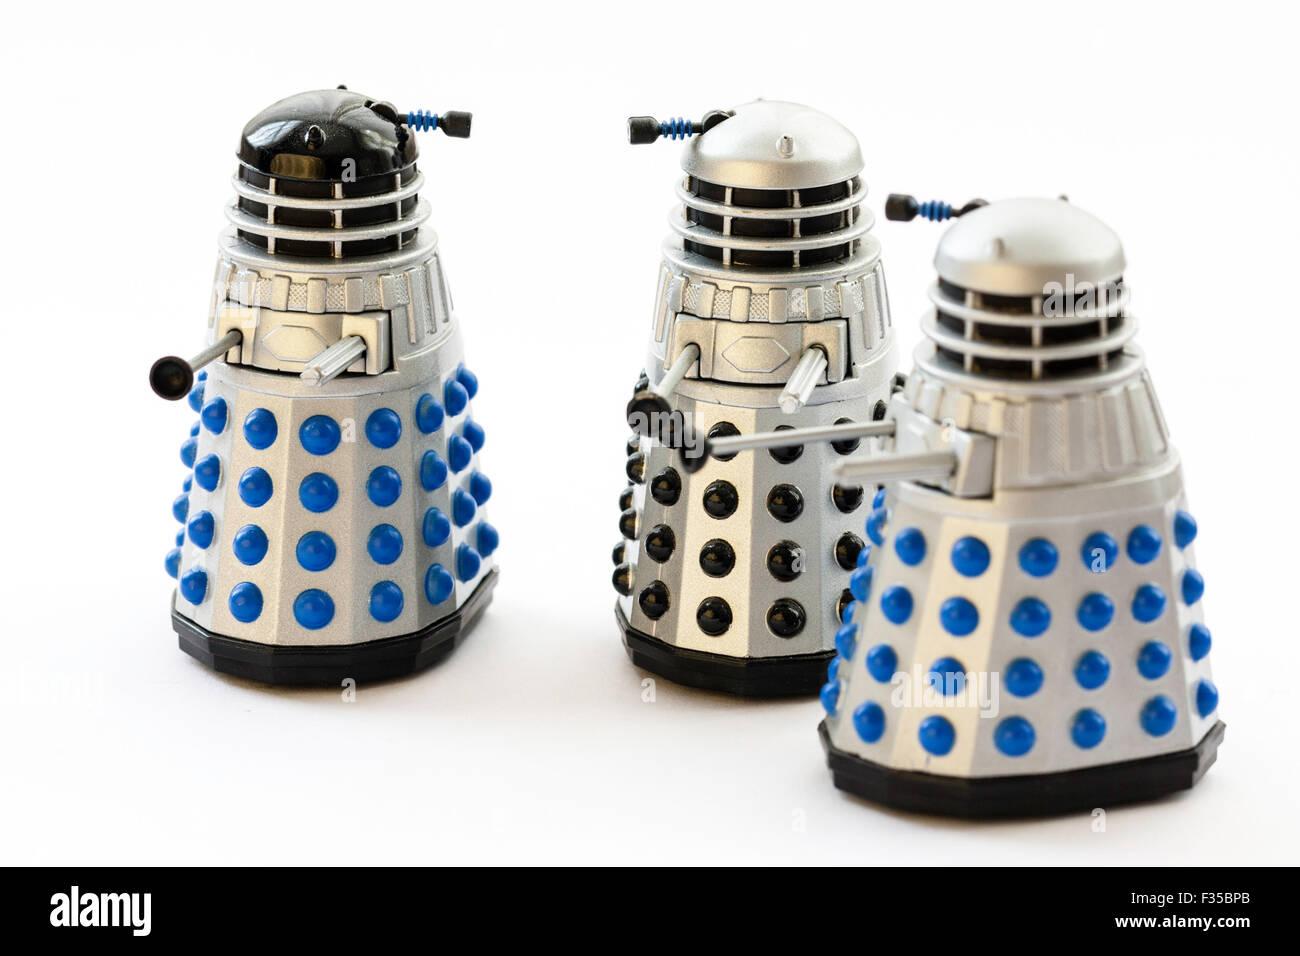 BBC TV series, Doctor Who, three model toy metal Daleks on plain background - Stock Image